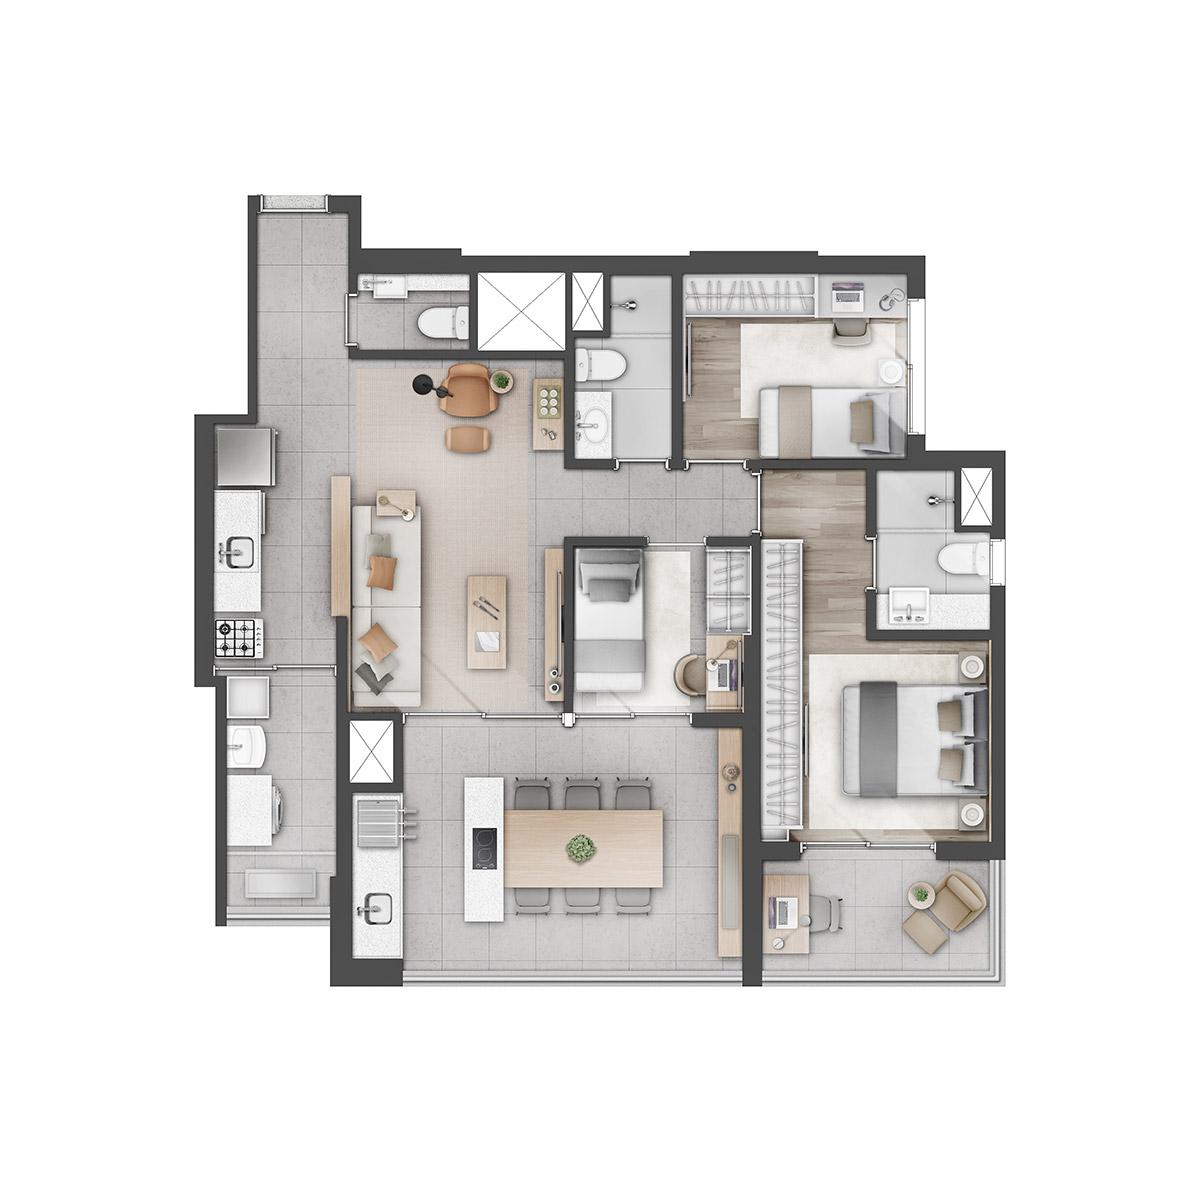 ALTA ROMANA by REM - 2 Dorms.